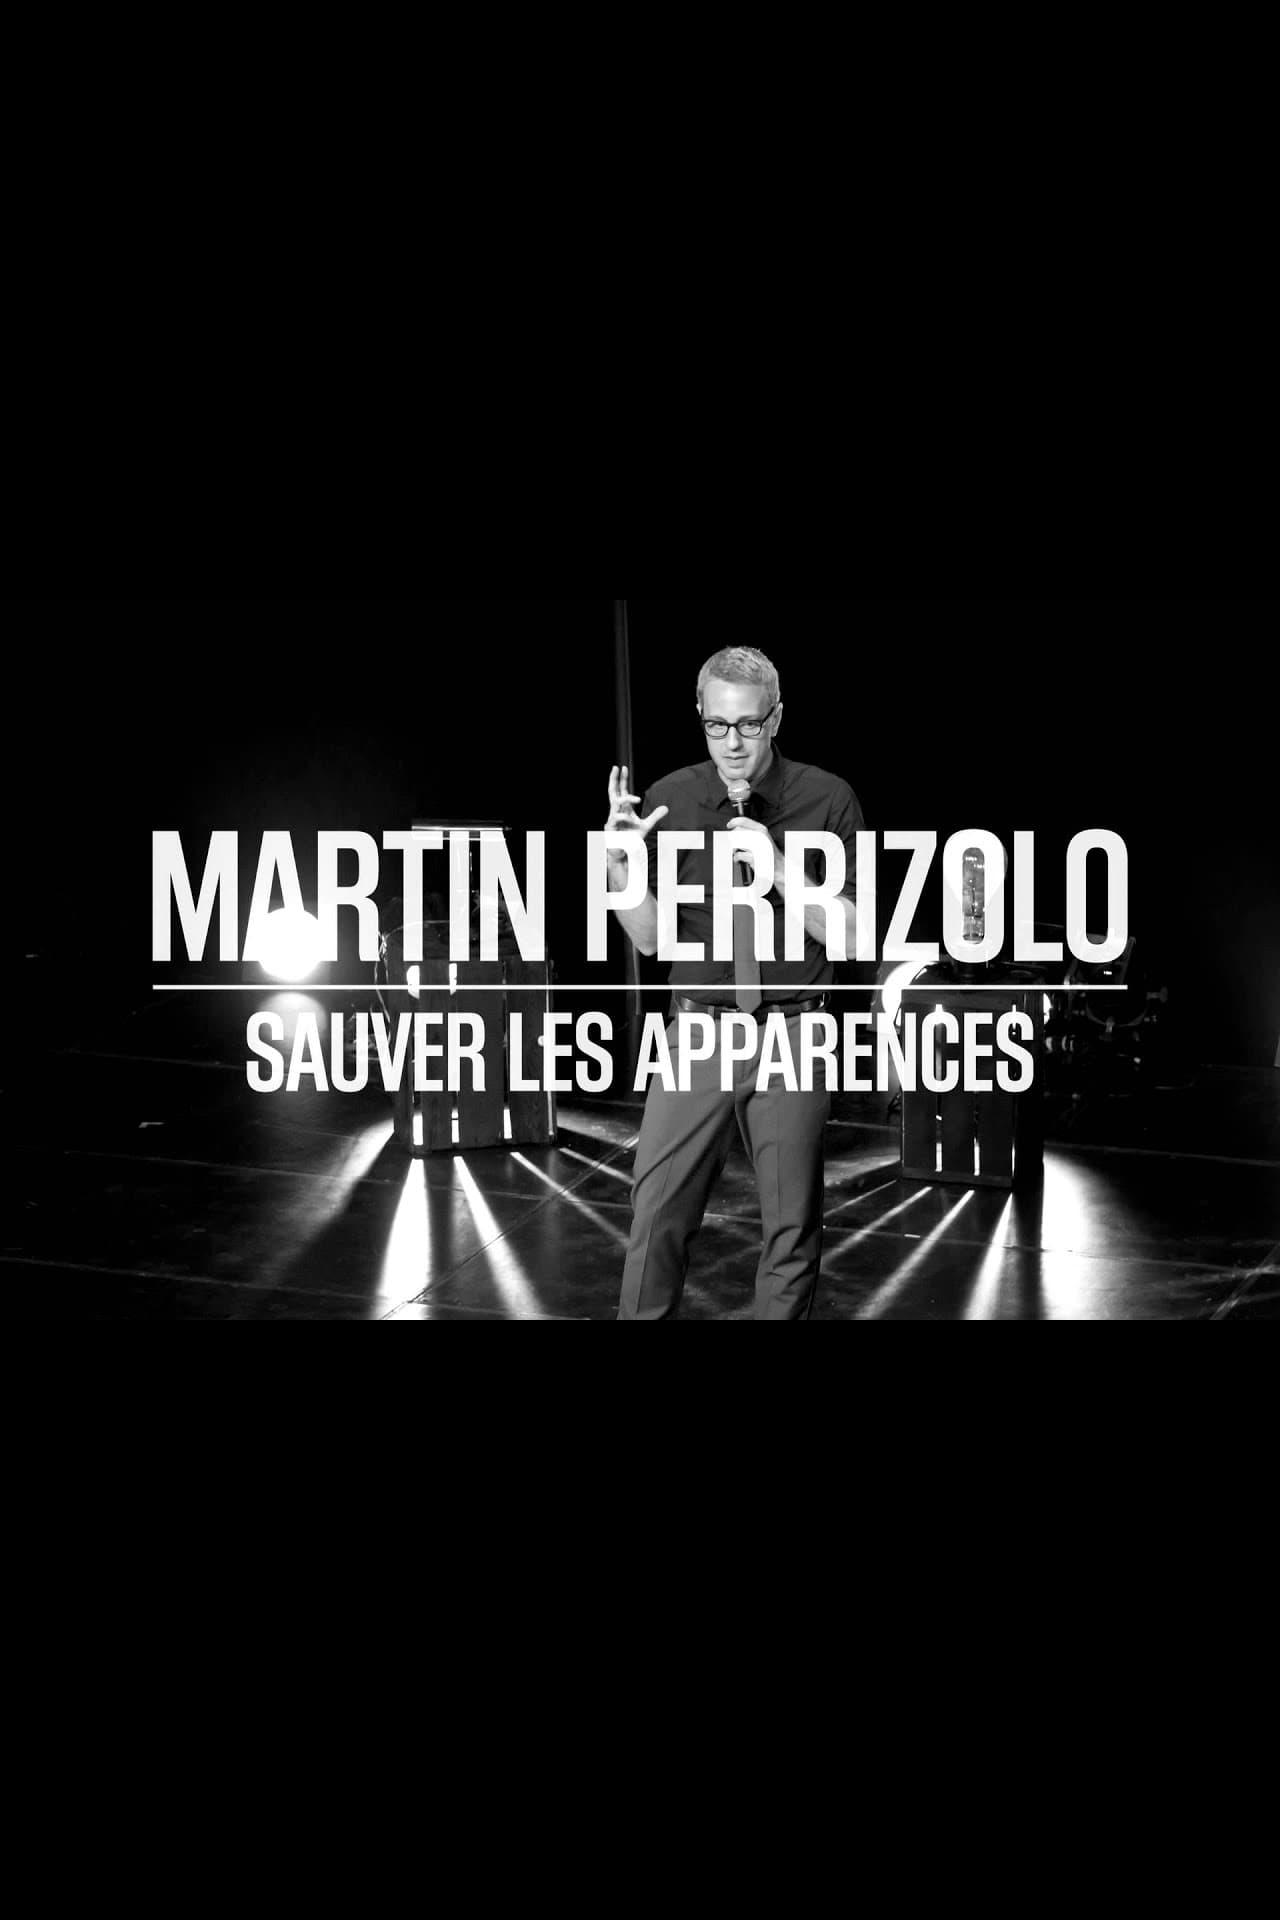 Martin Perizzolo: Sauver les apparences (2013)